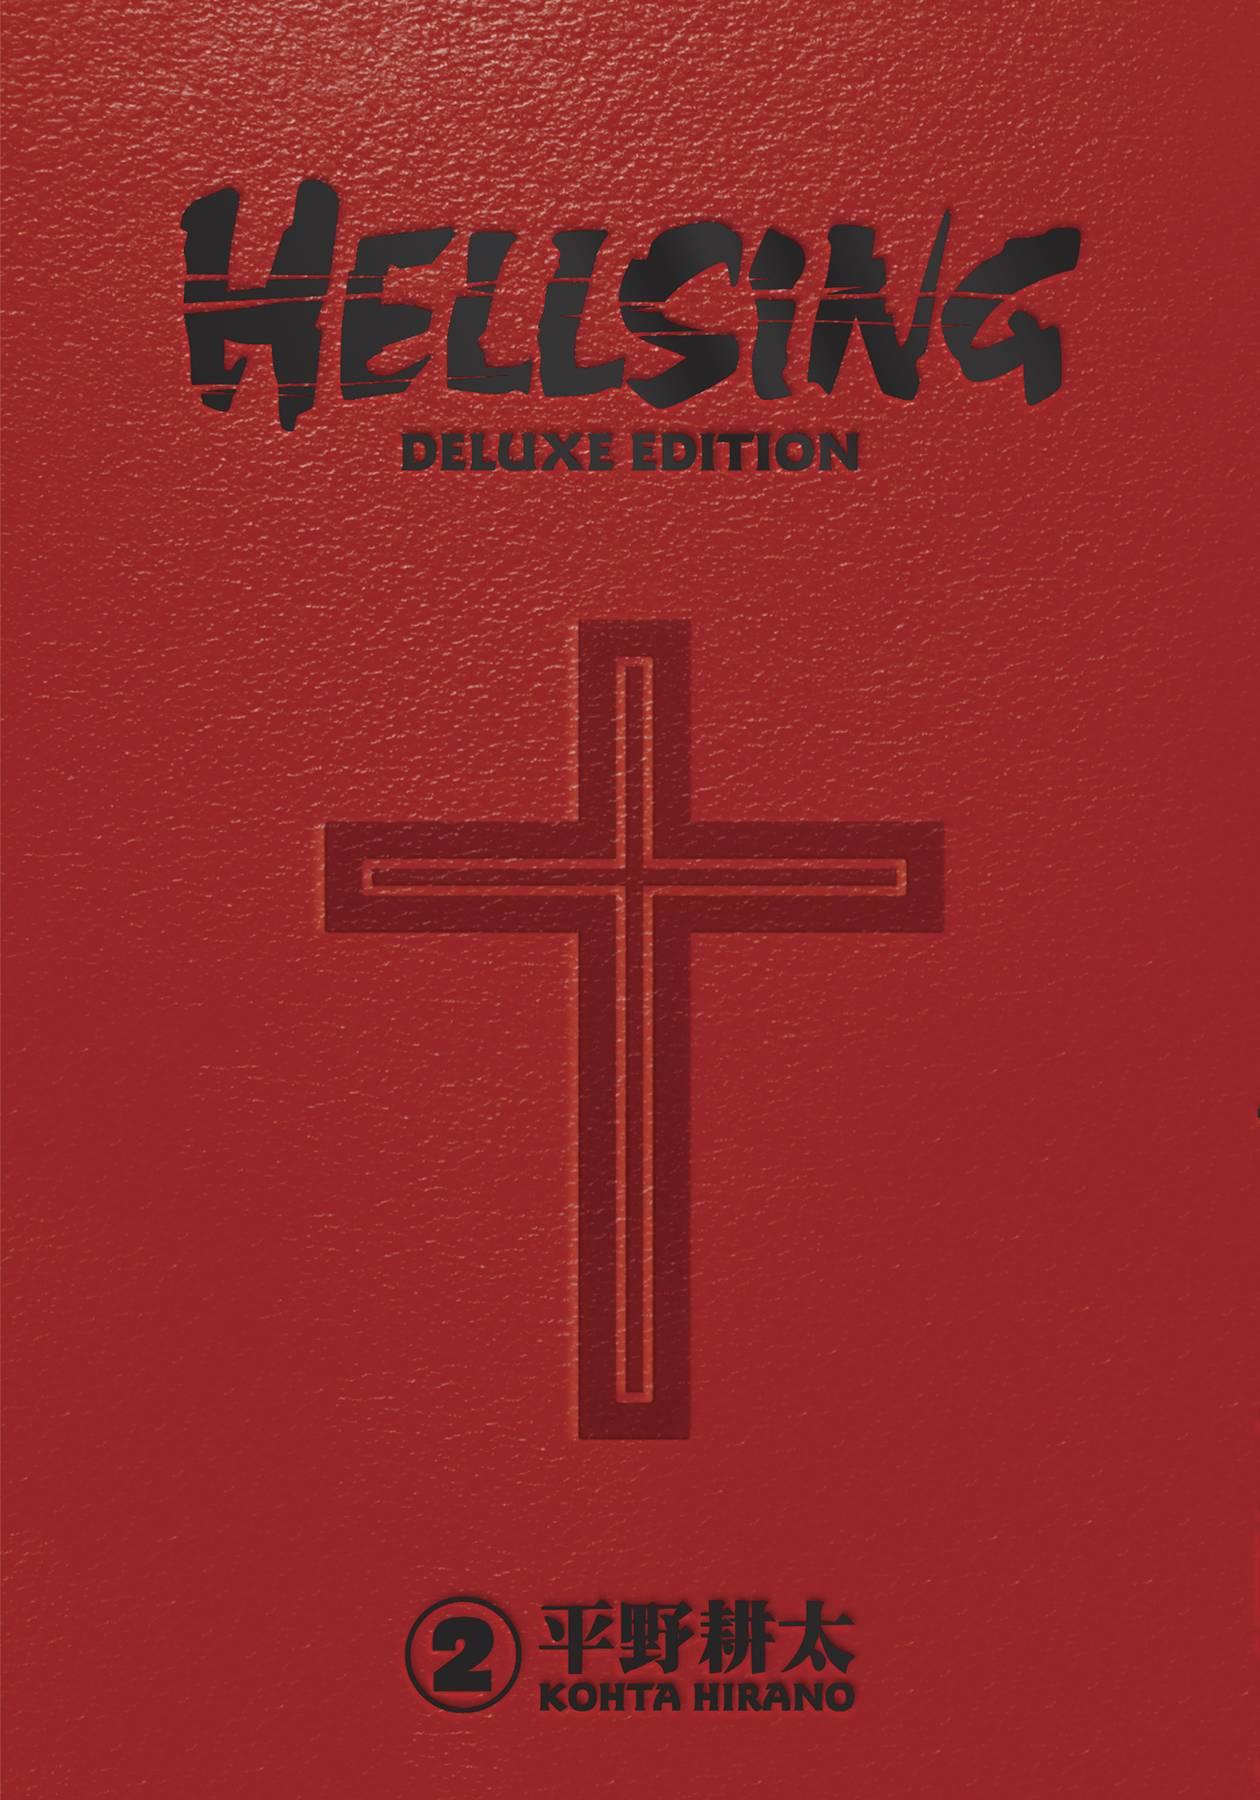 HELLSING DELUXE EDITION HC 02